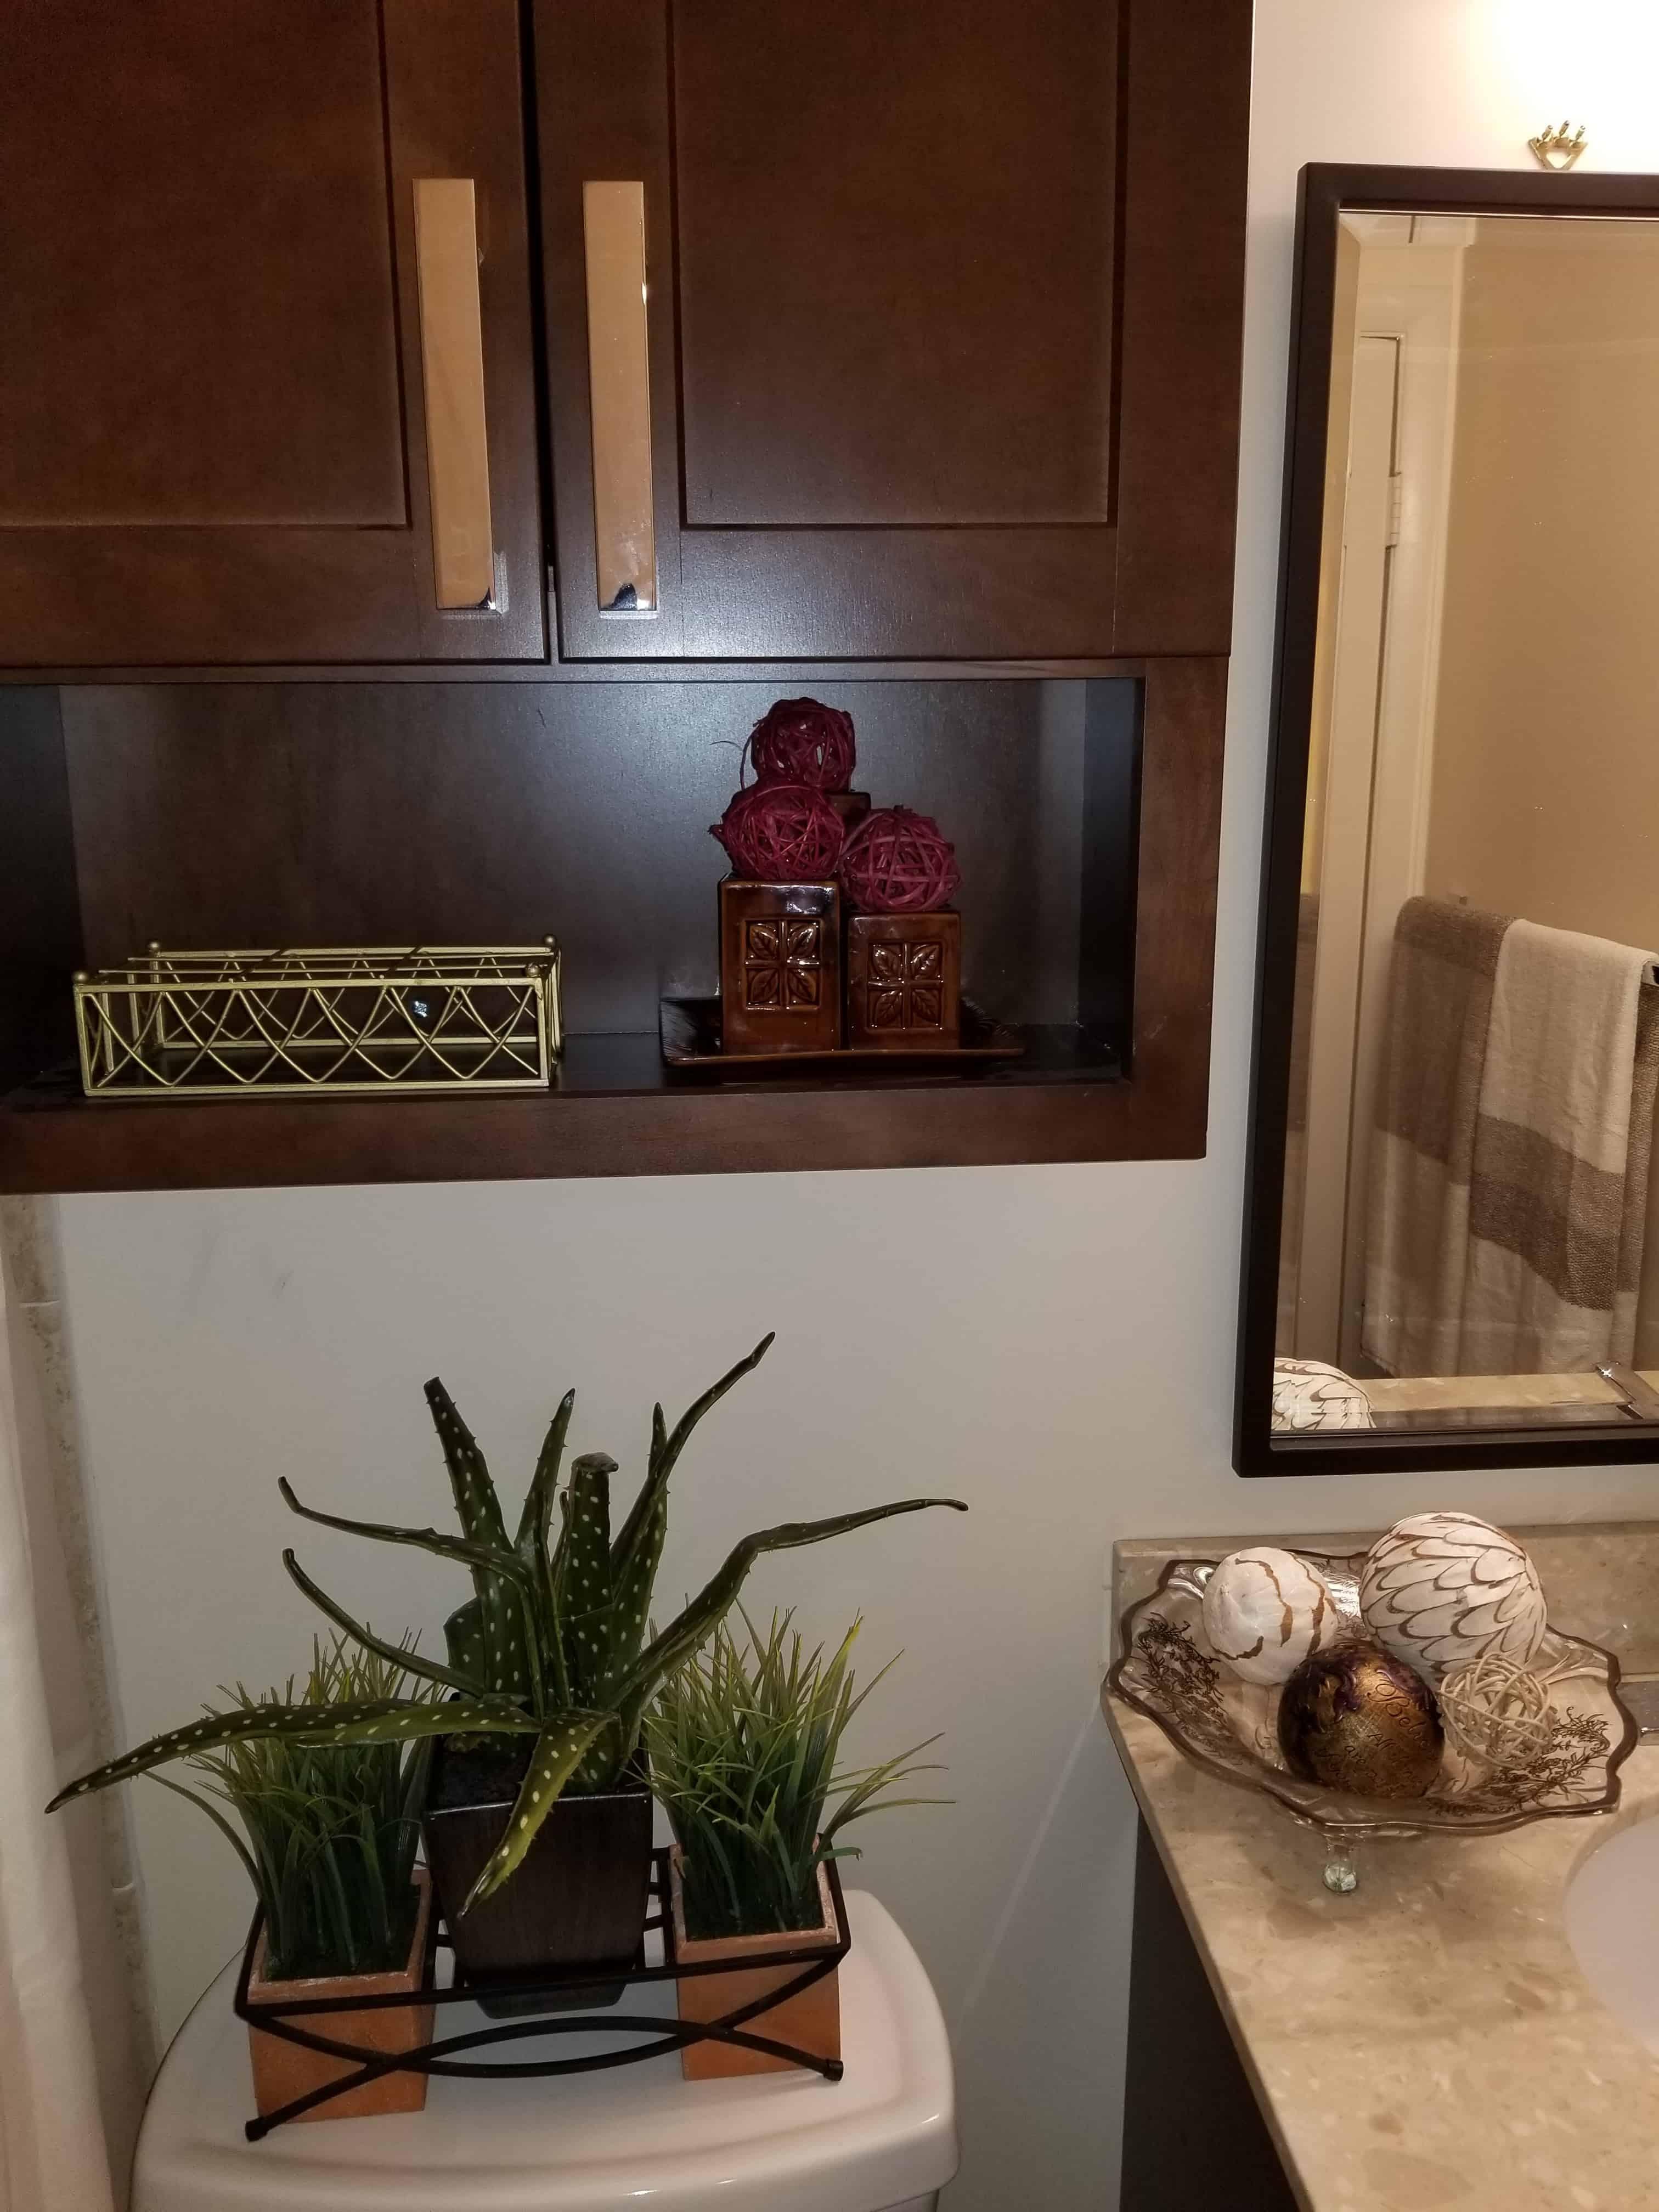 https://0201.nccdn.net/1_2/000/000/0c6/319/BathroomAccessories-min-3024x4032.jpg